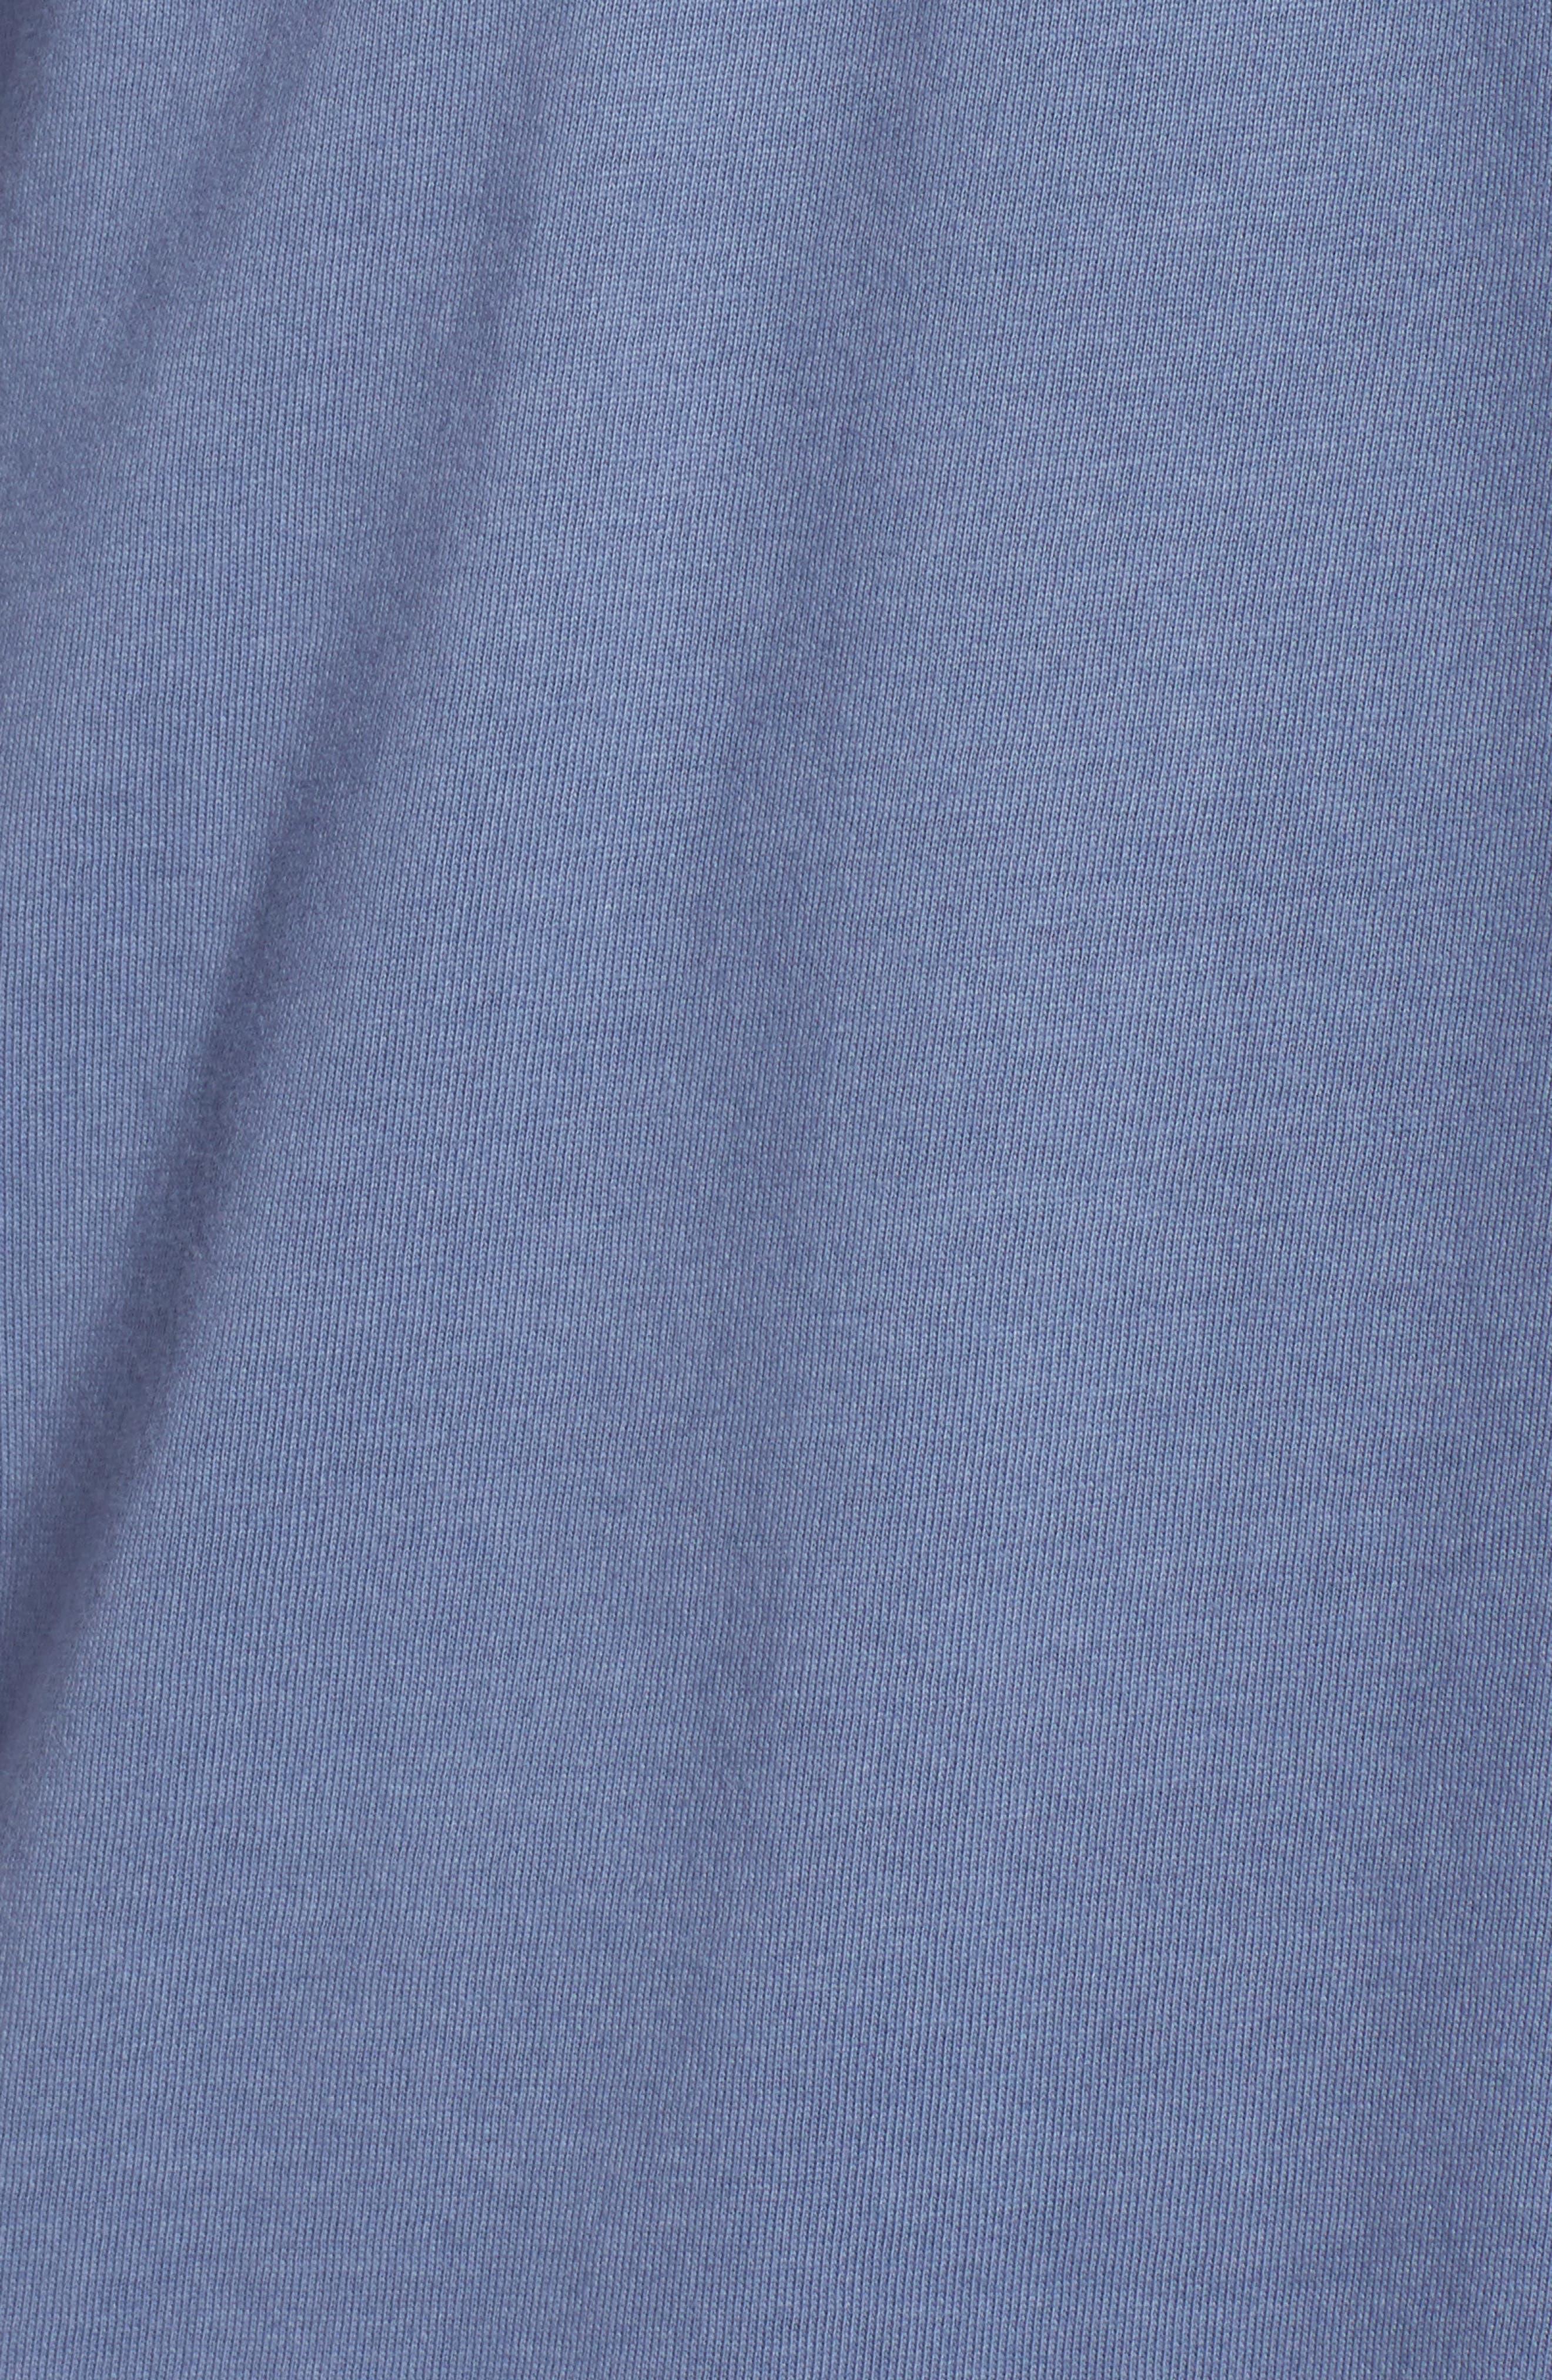 Last Resort Pocket T-Shirt,                             Alternate thumbnail 5, color,                             Deep Blue